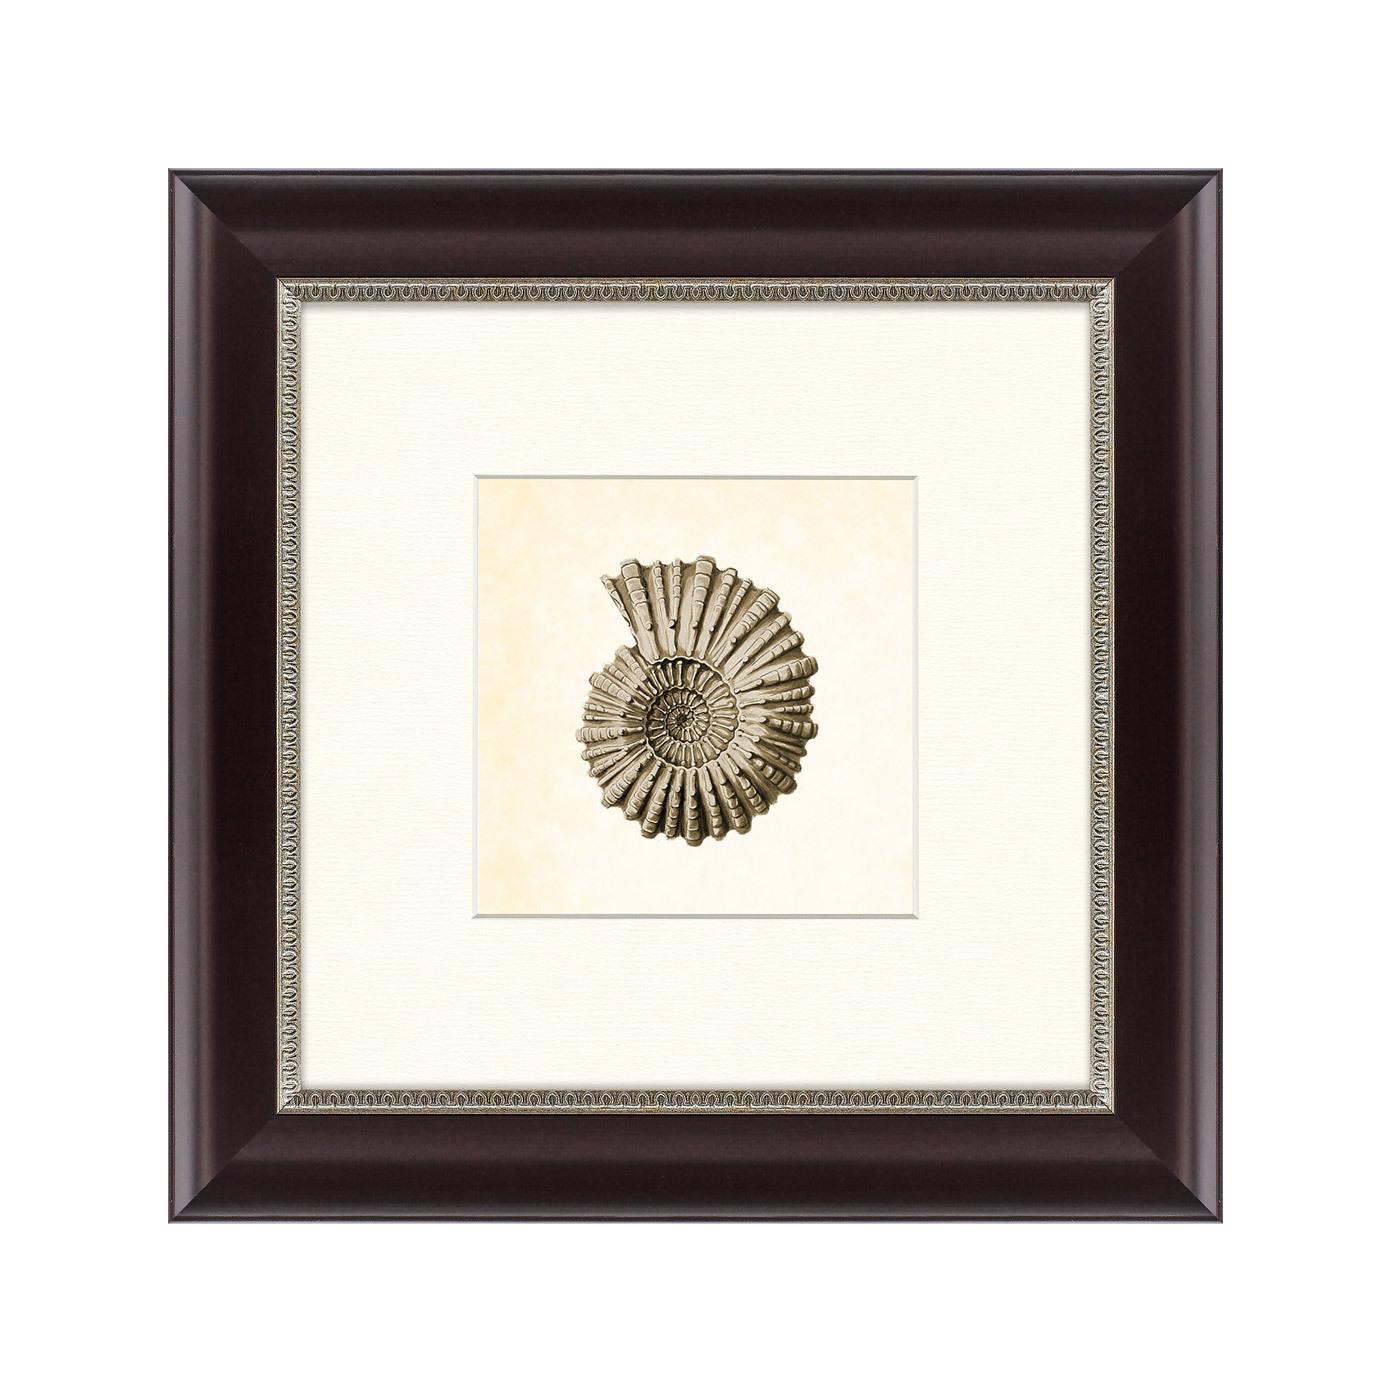 {} Картины в Квартиру Картина Морской Обитатель №3 (35х35 см) картины в квартиру картина каллы 2 35х35 см